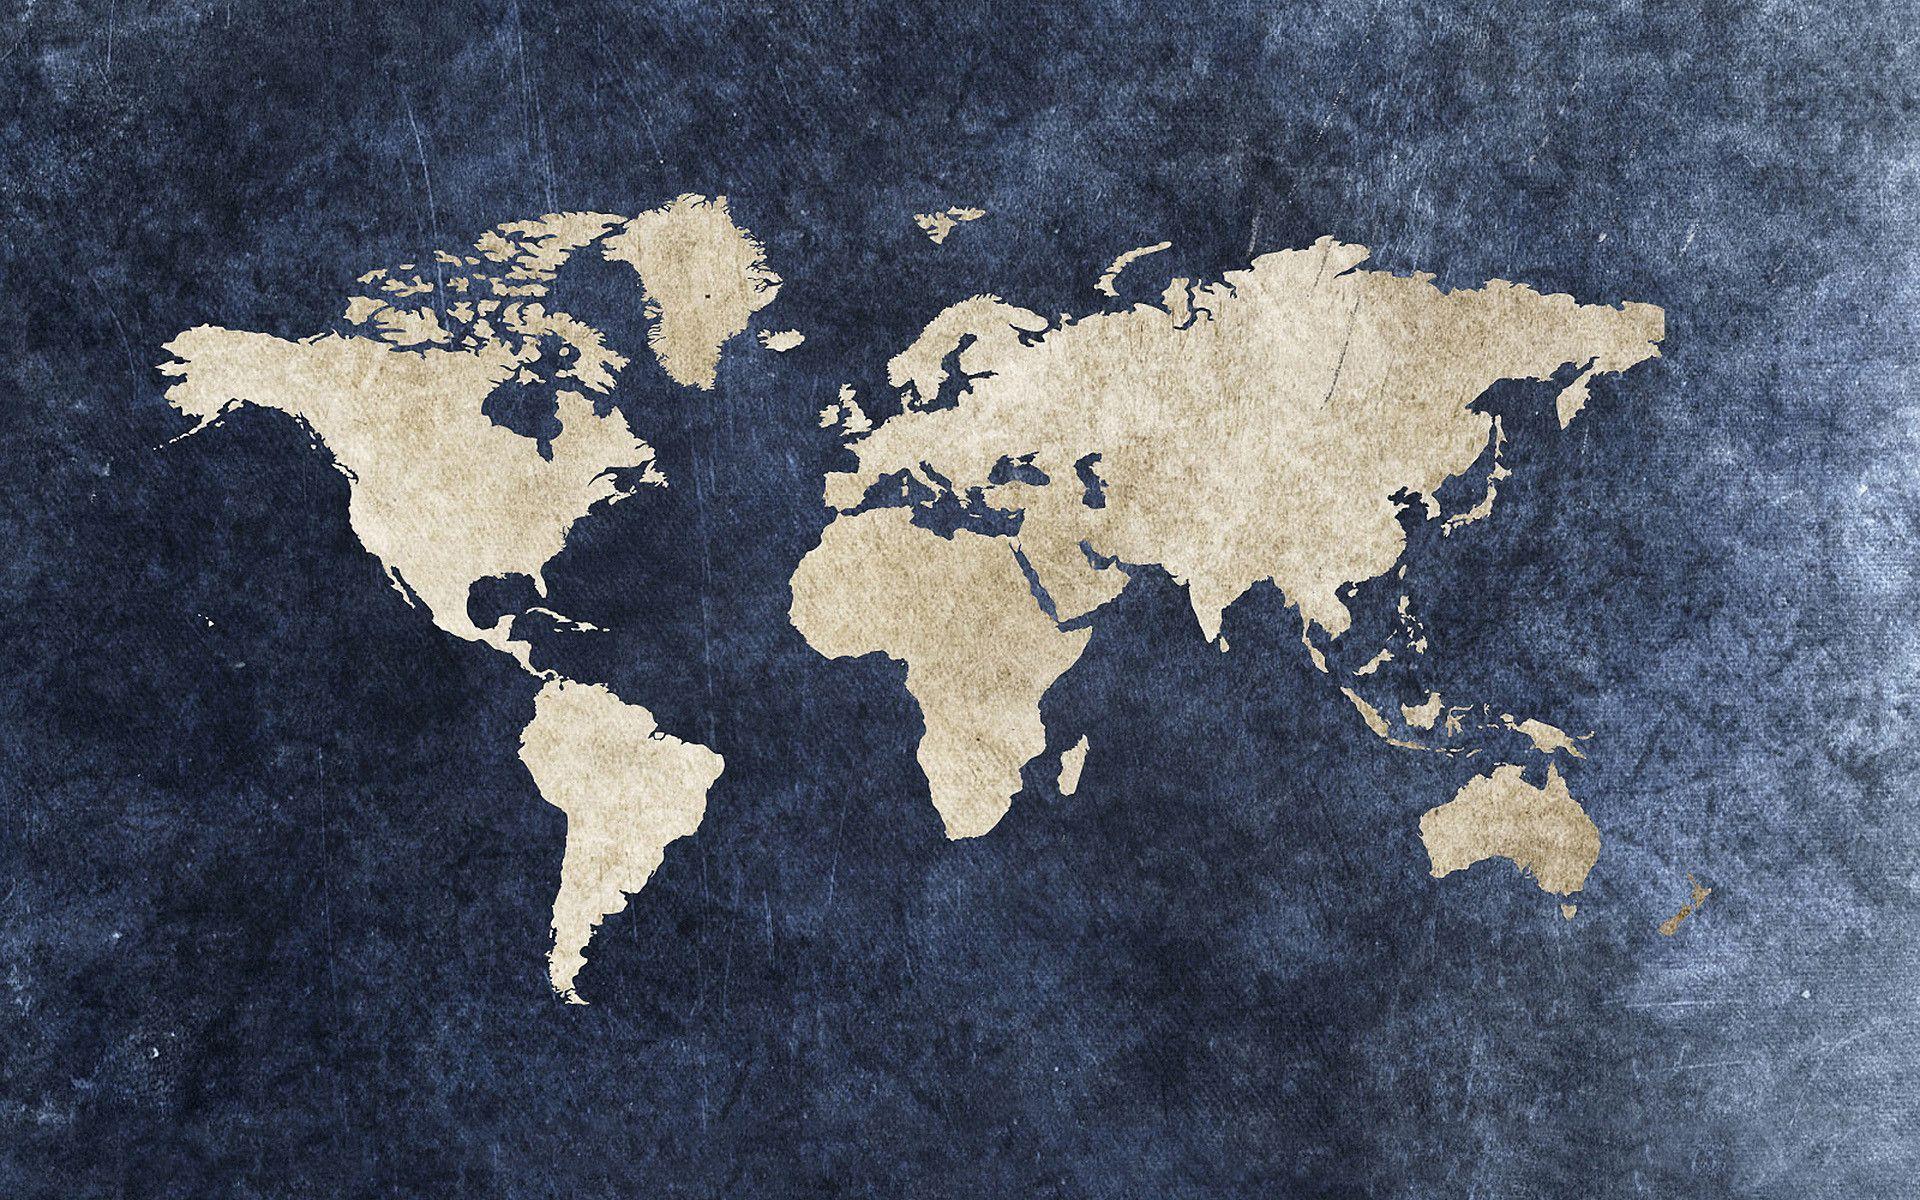 files Free Download Digital world map